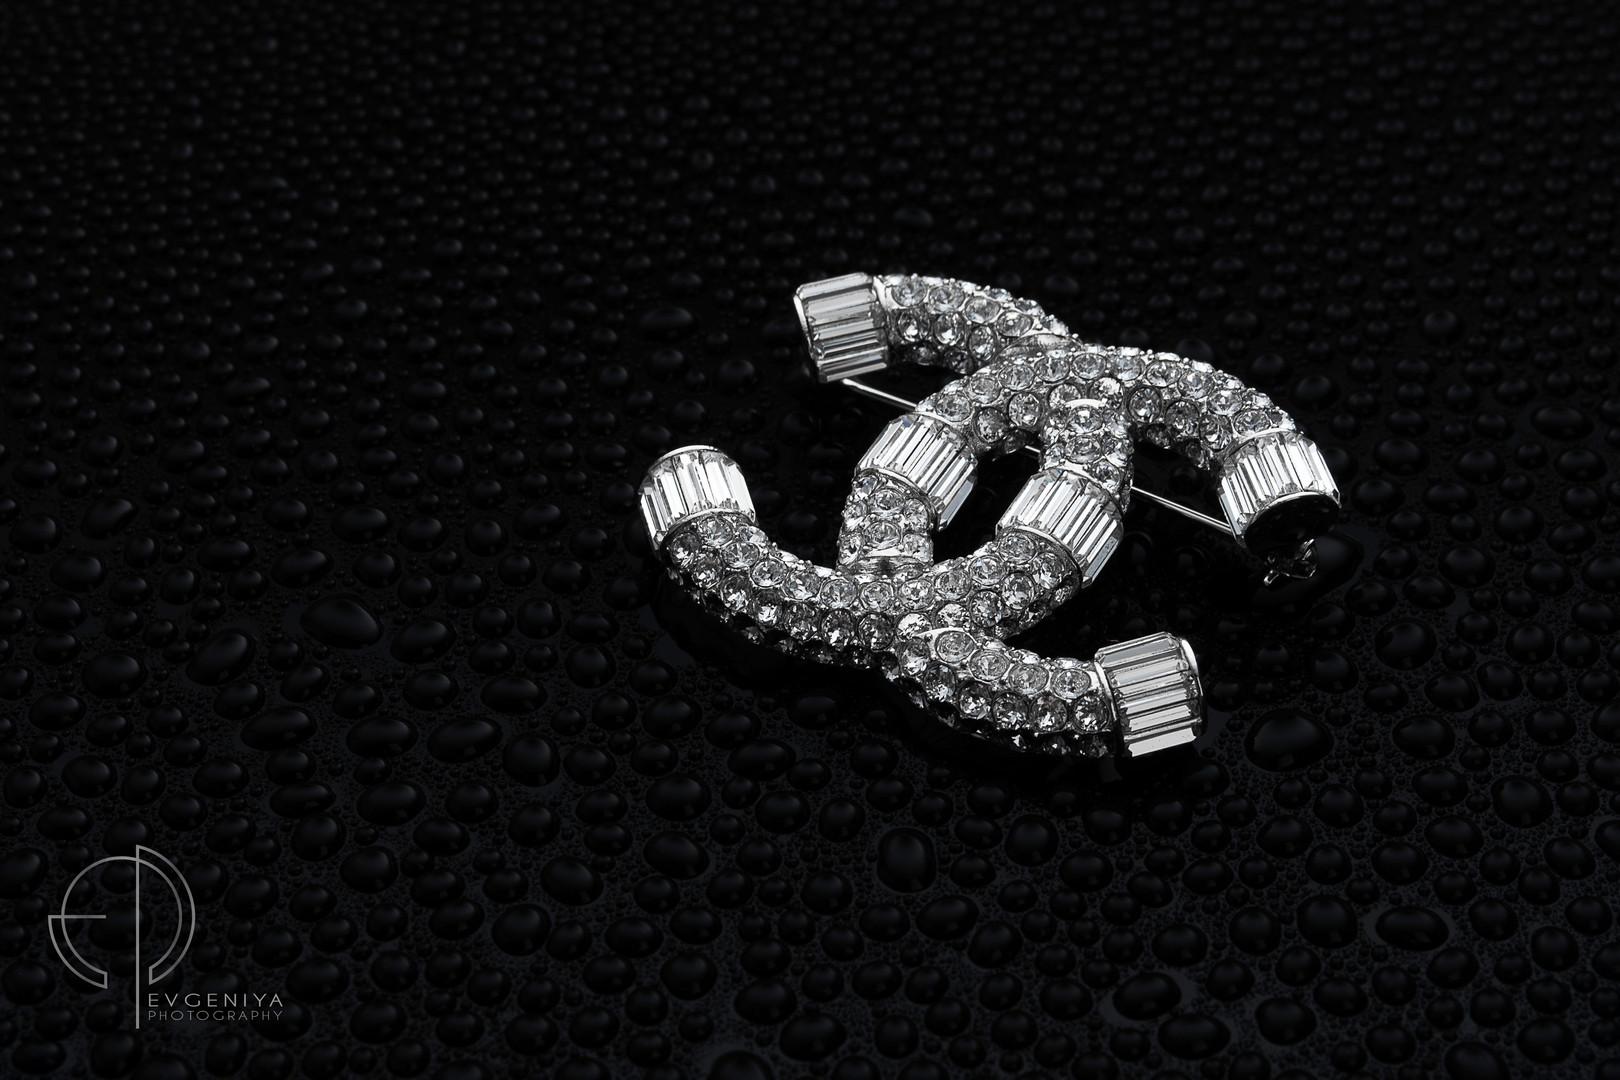 Broche Chanel